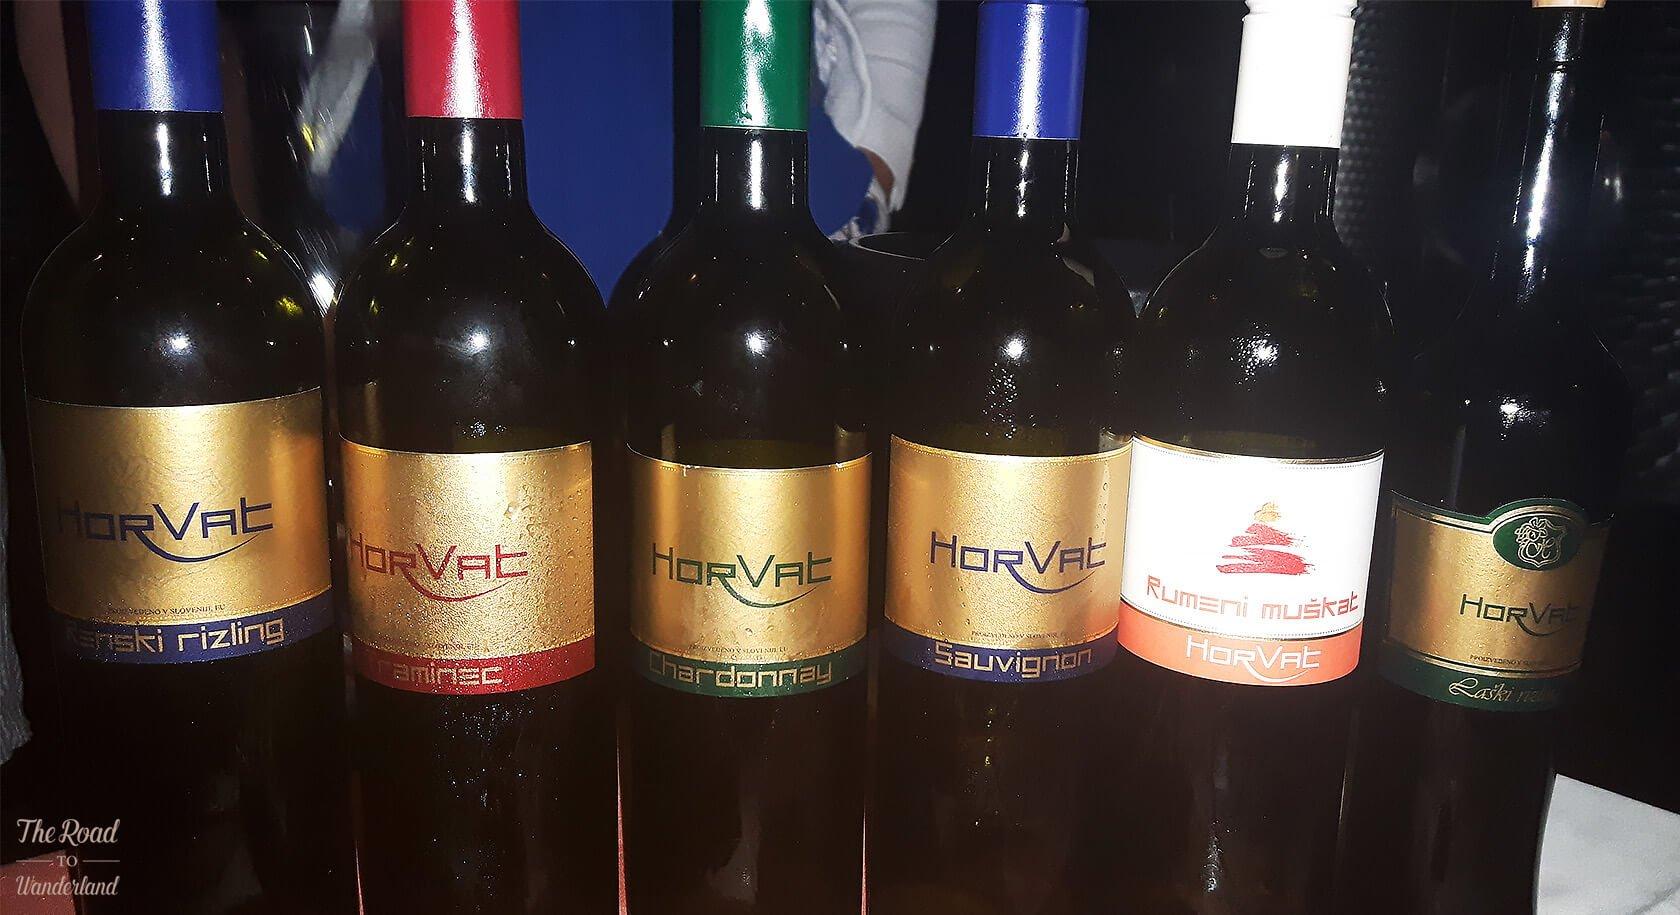 Vinogradi Horvat wine tasting